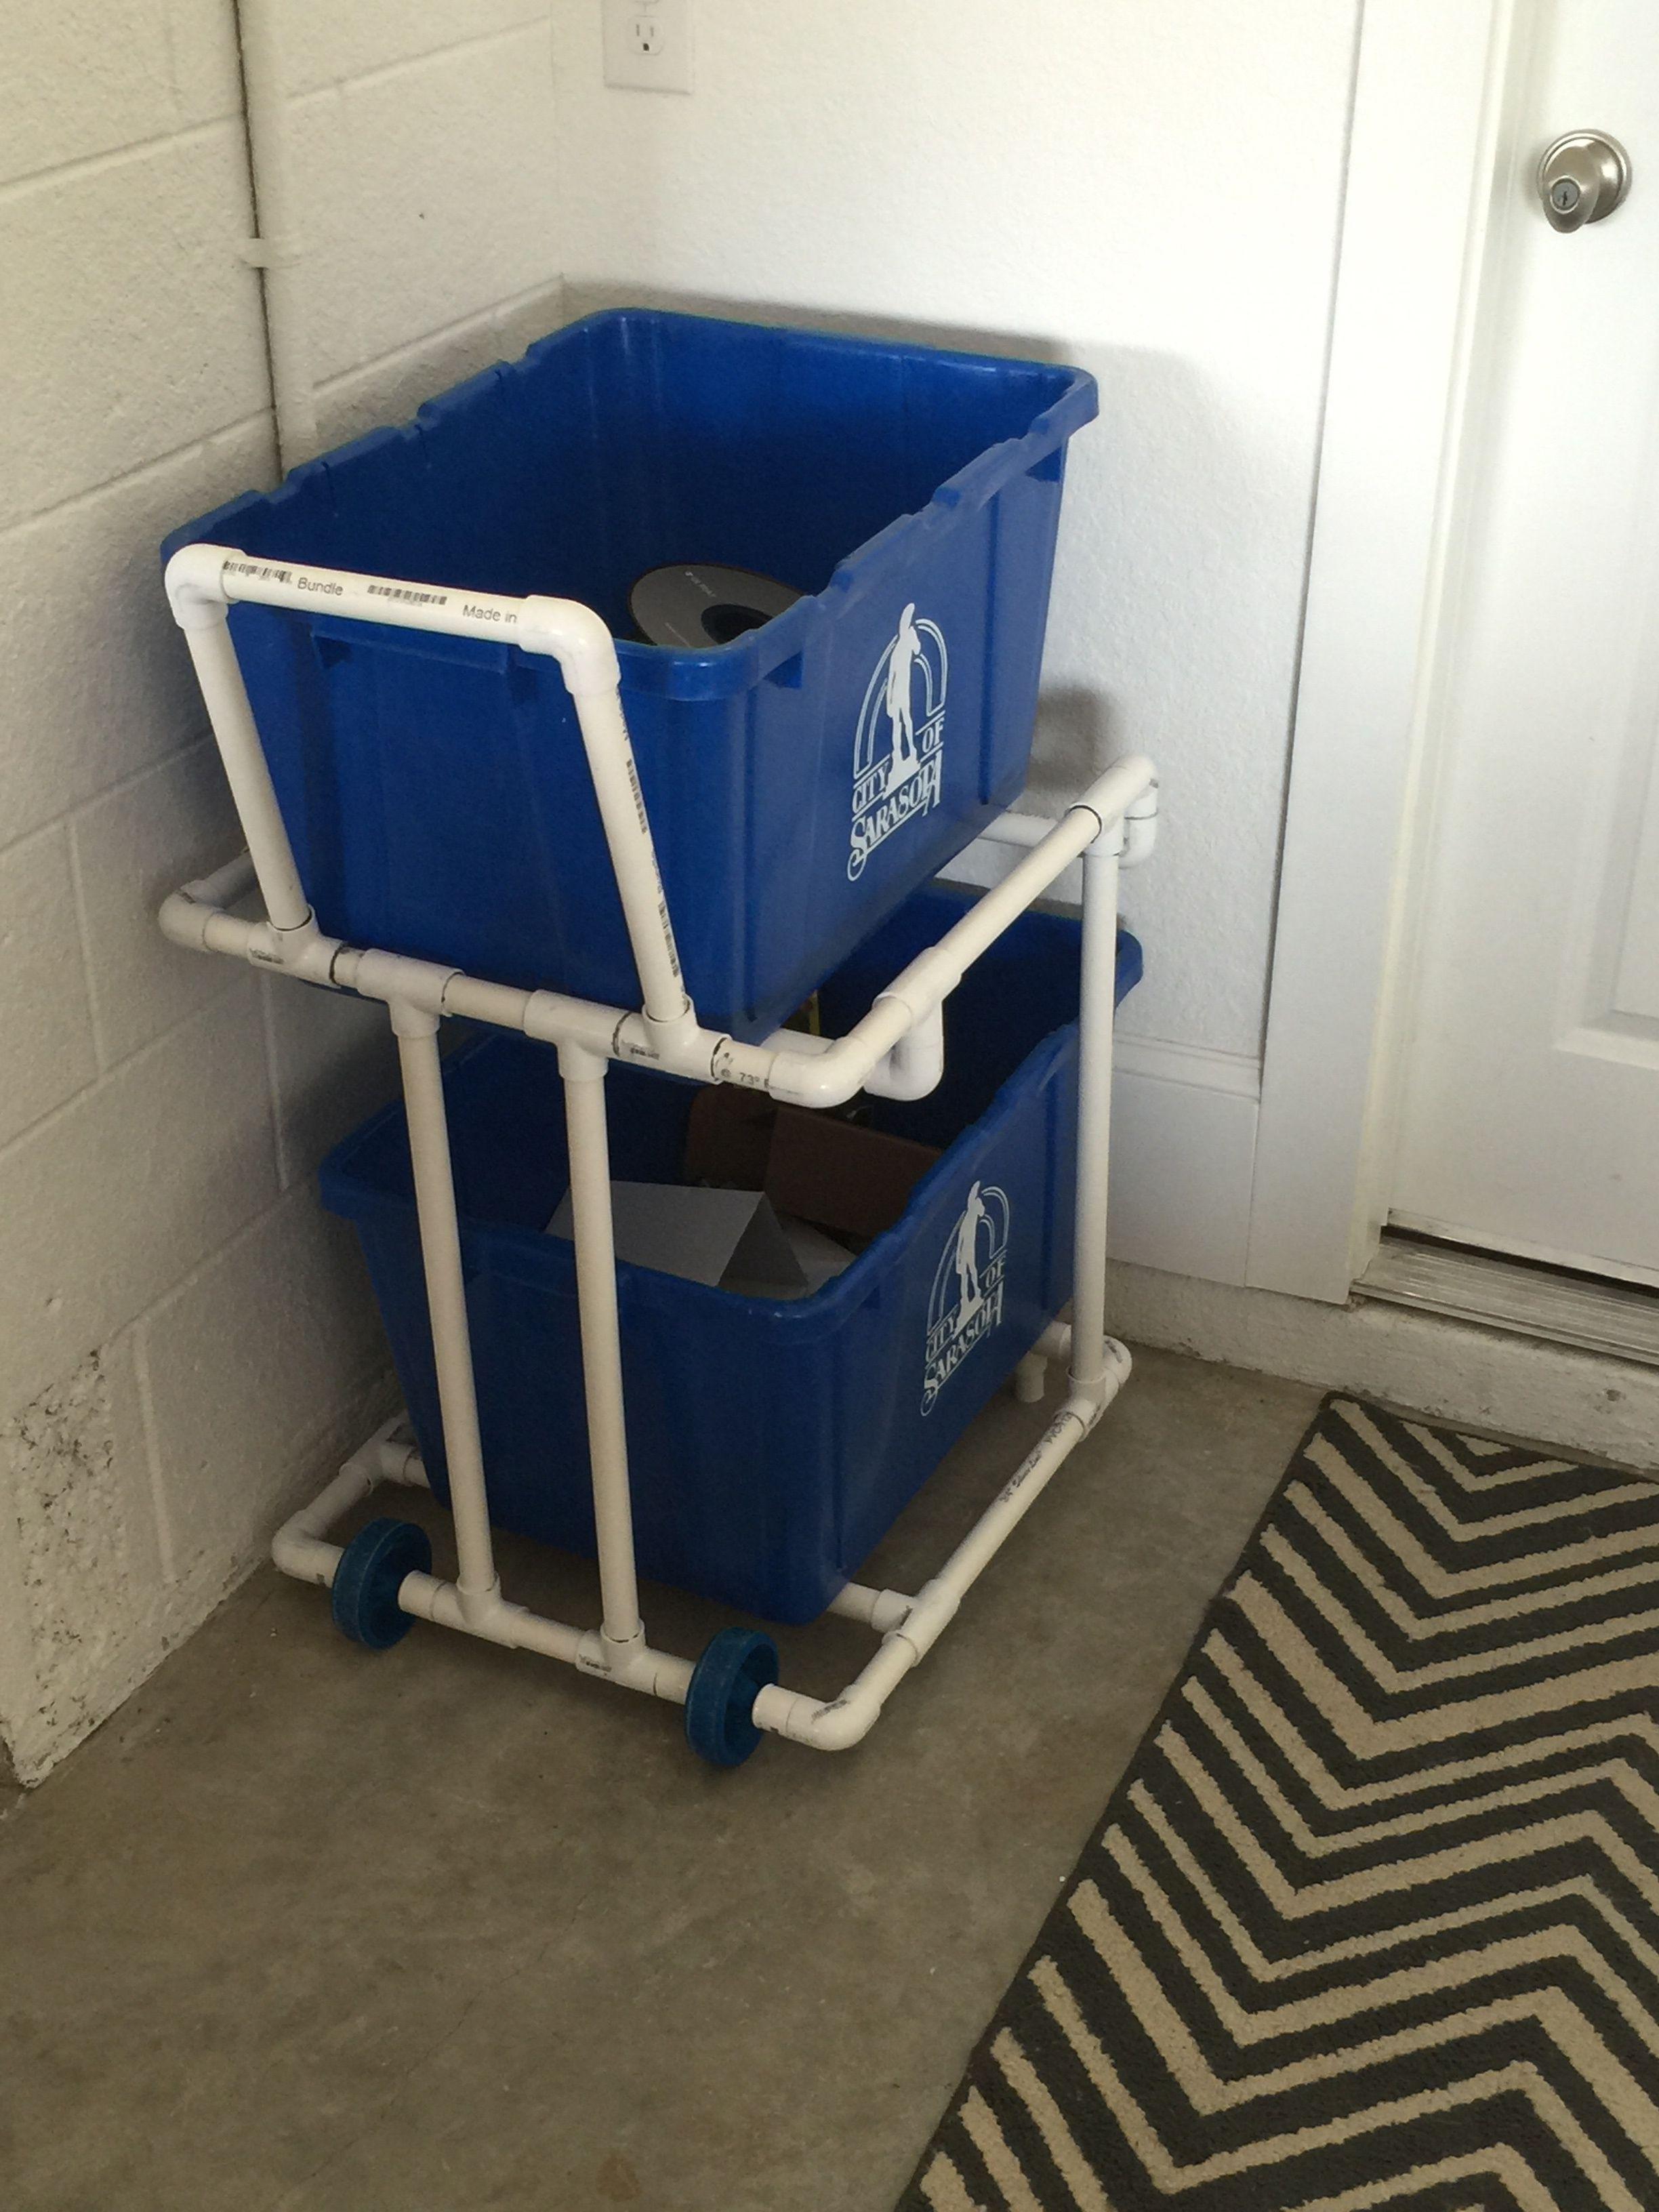 ingenious home recycling bin ideas. Recycling Bin Cart 3D Printed Wheels  Pvc body Retail Cost 50 plus DIY